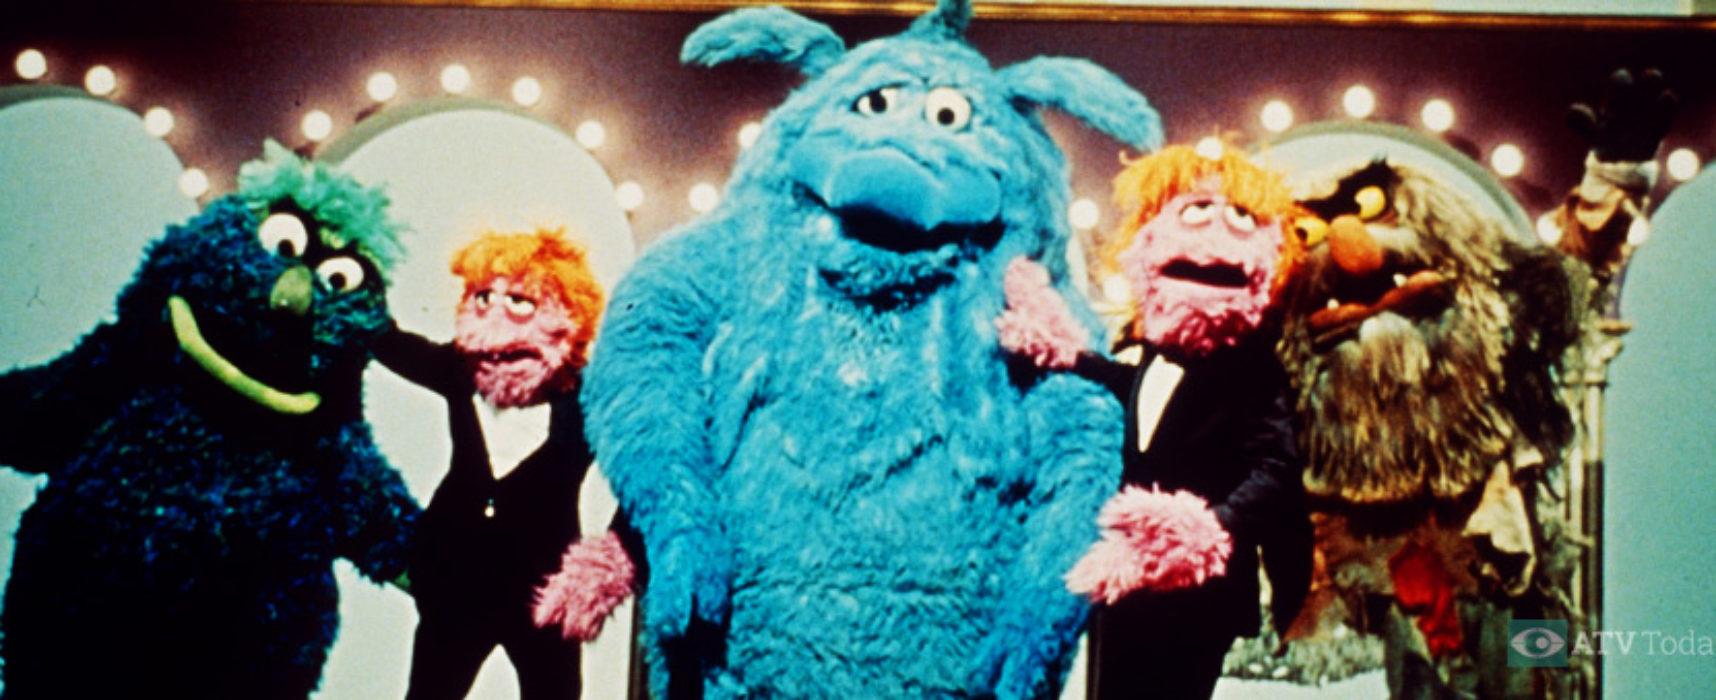 Nostalgia podcast celebrates the world of The Muppet Show